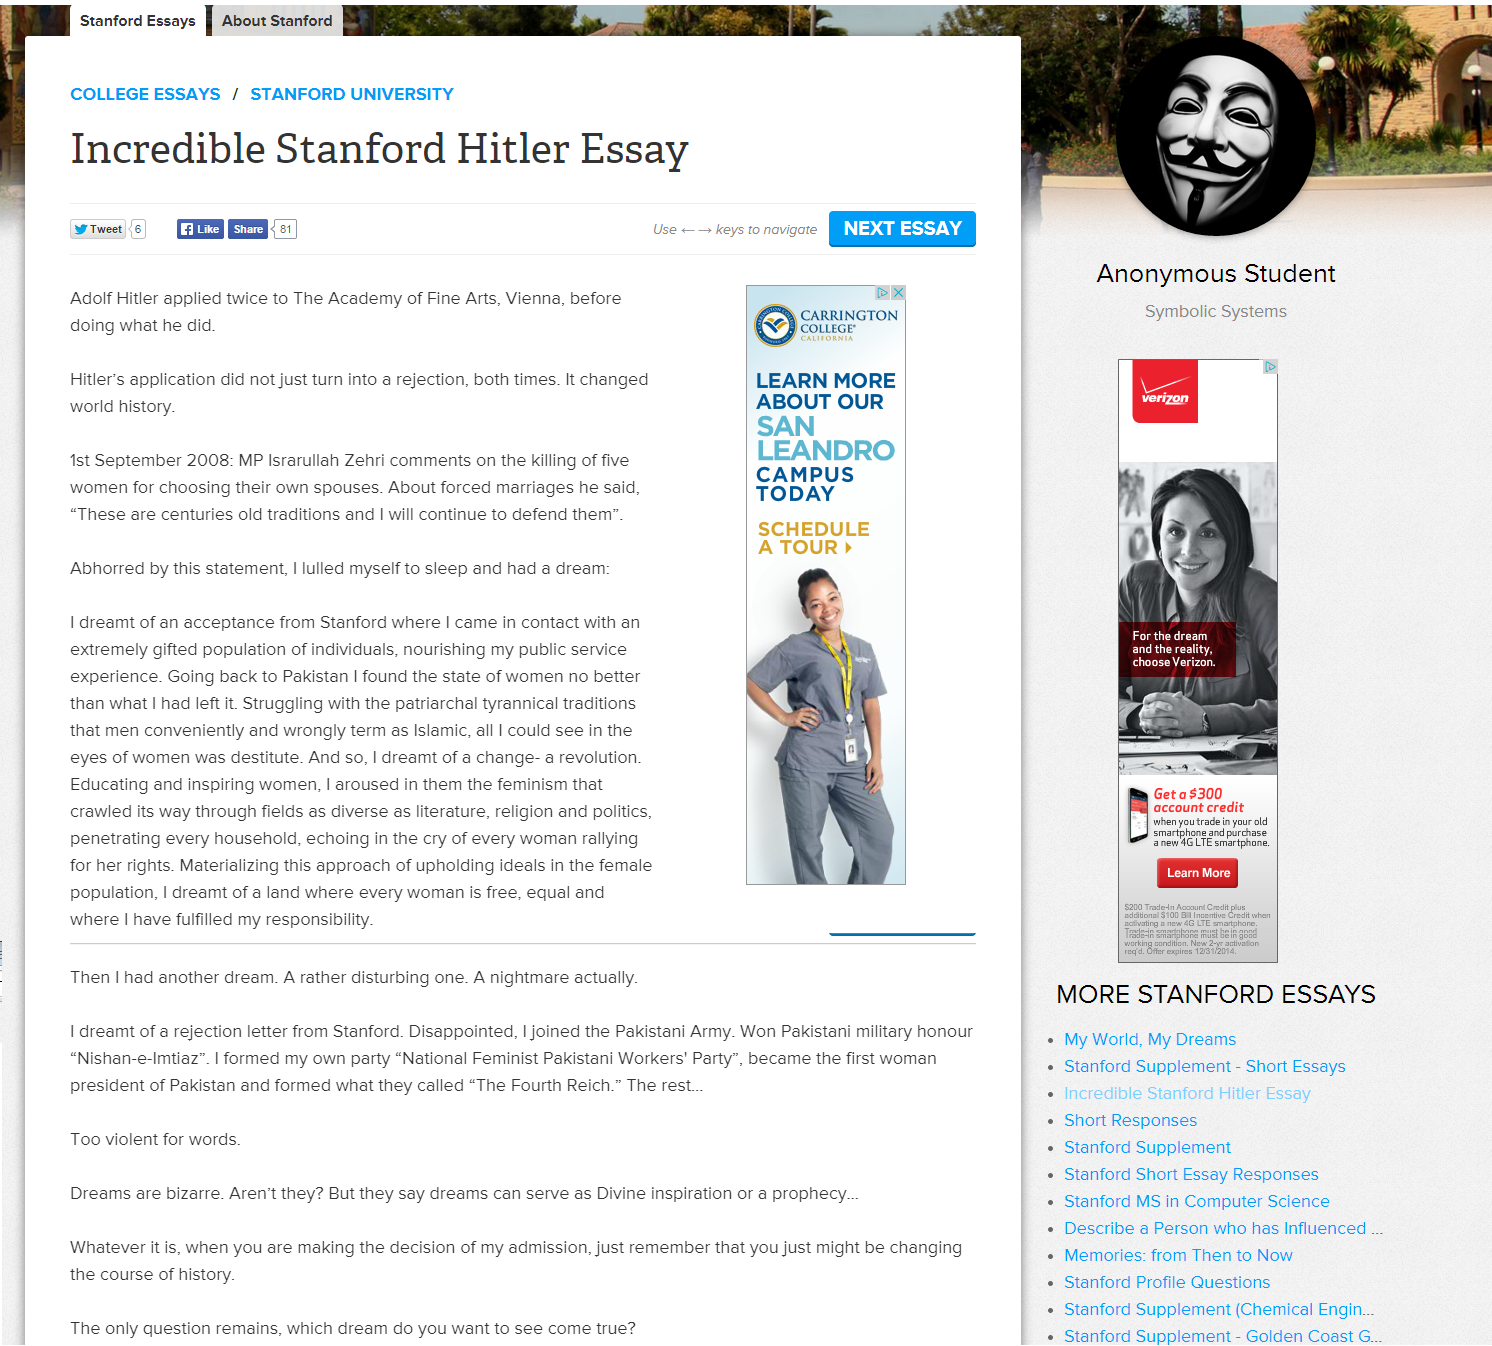 011 Essay Reworder Example Thebestcollegeessaywaslookingforessaystobase 195e1b 5381618 Magnificent Best Rewriter Software Free Download App Full